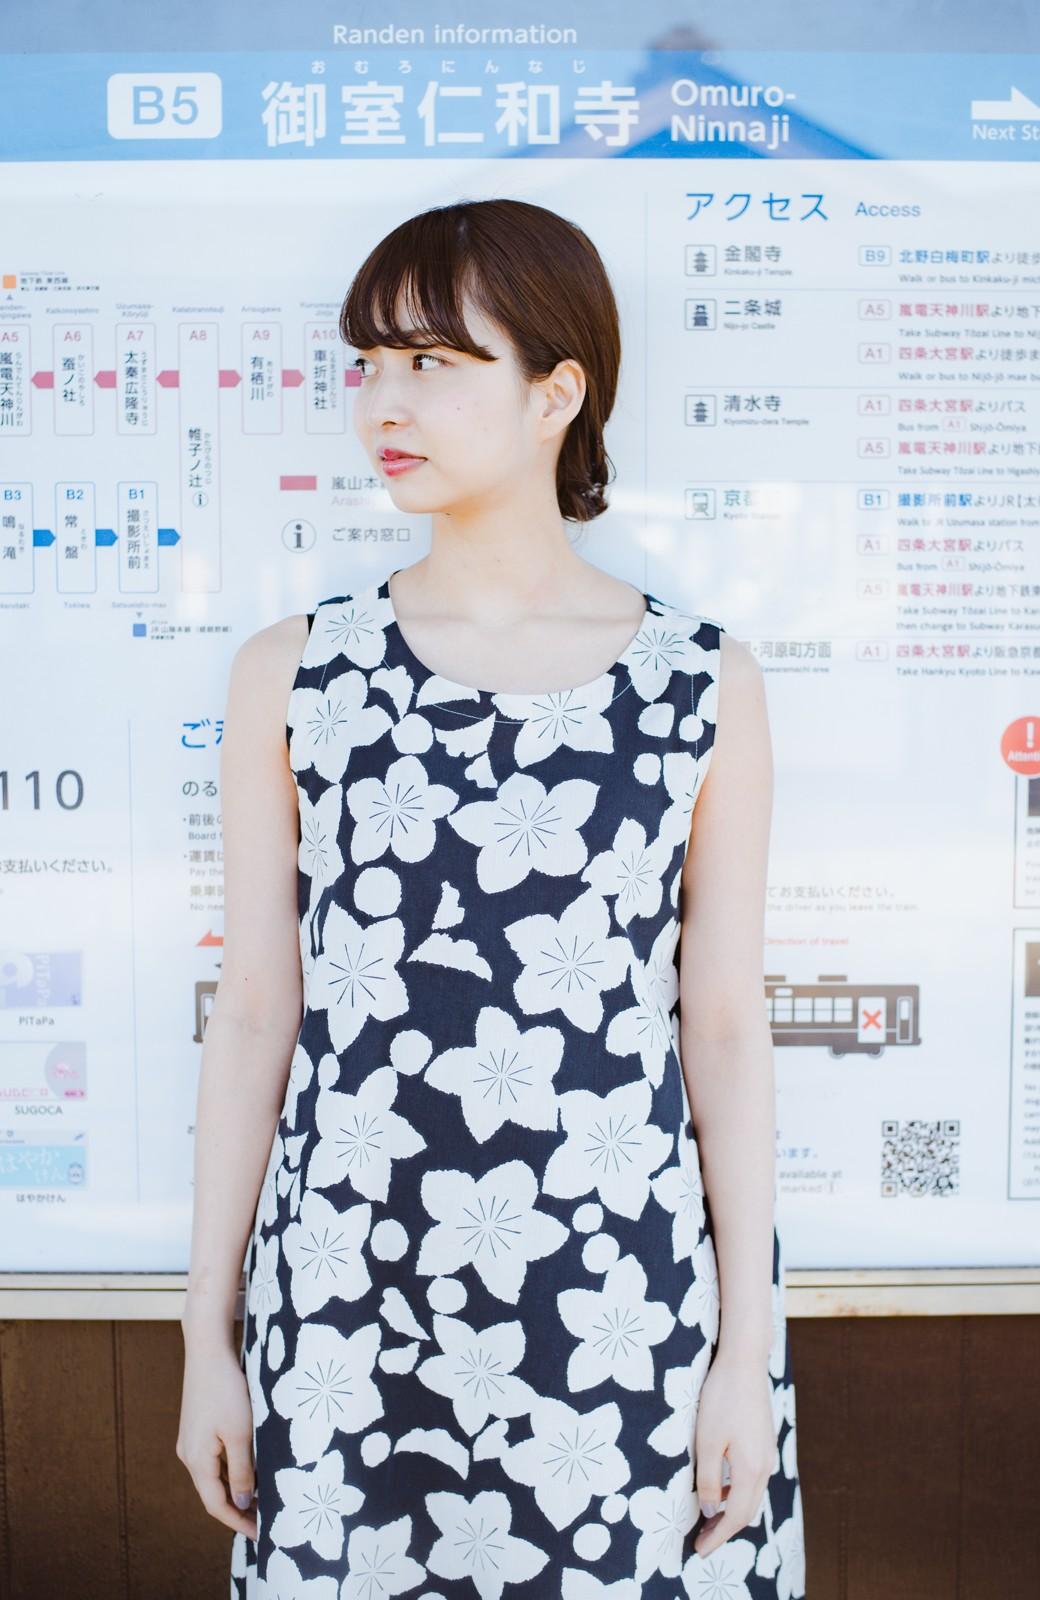 haco! 京都の浴衣屋さんと作った浴衣生地のワンピース <ブラック系その他>の商品写真7